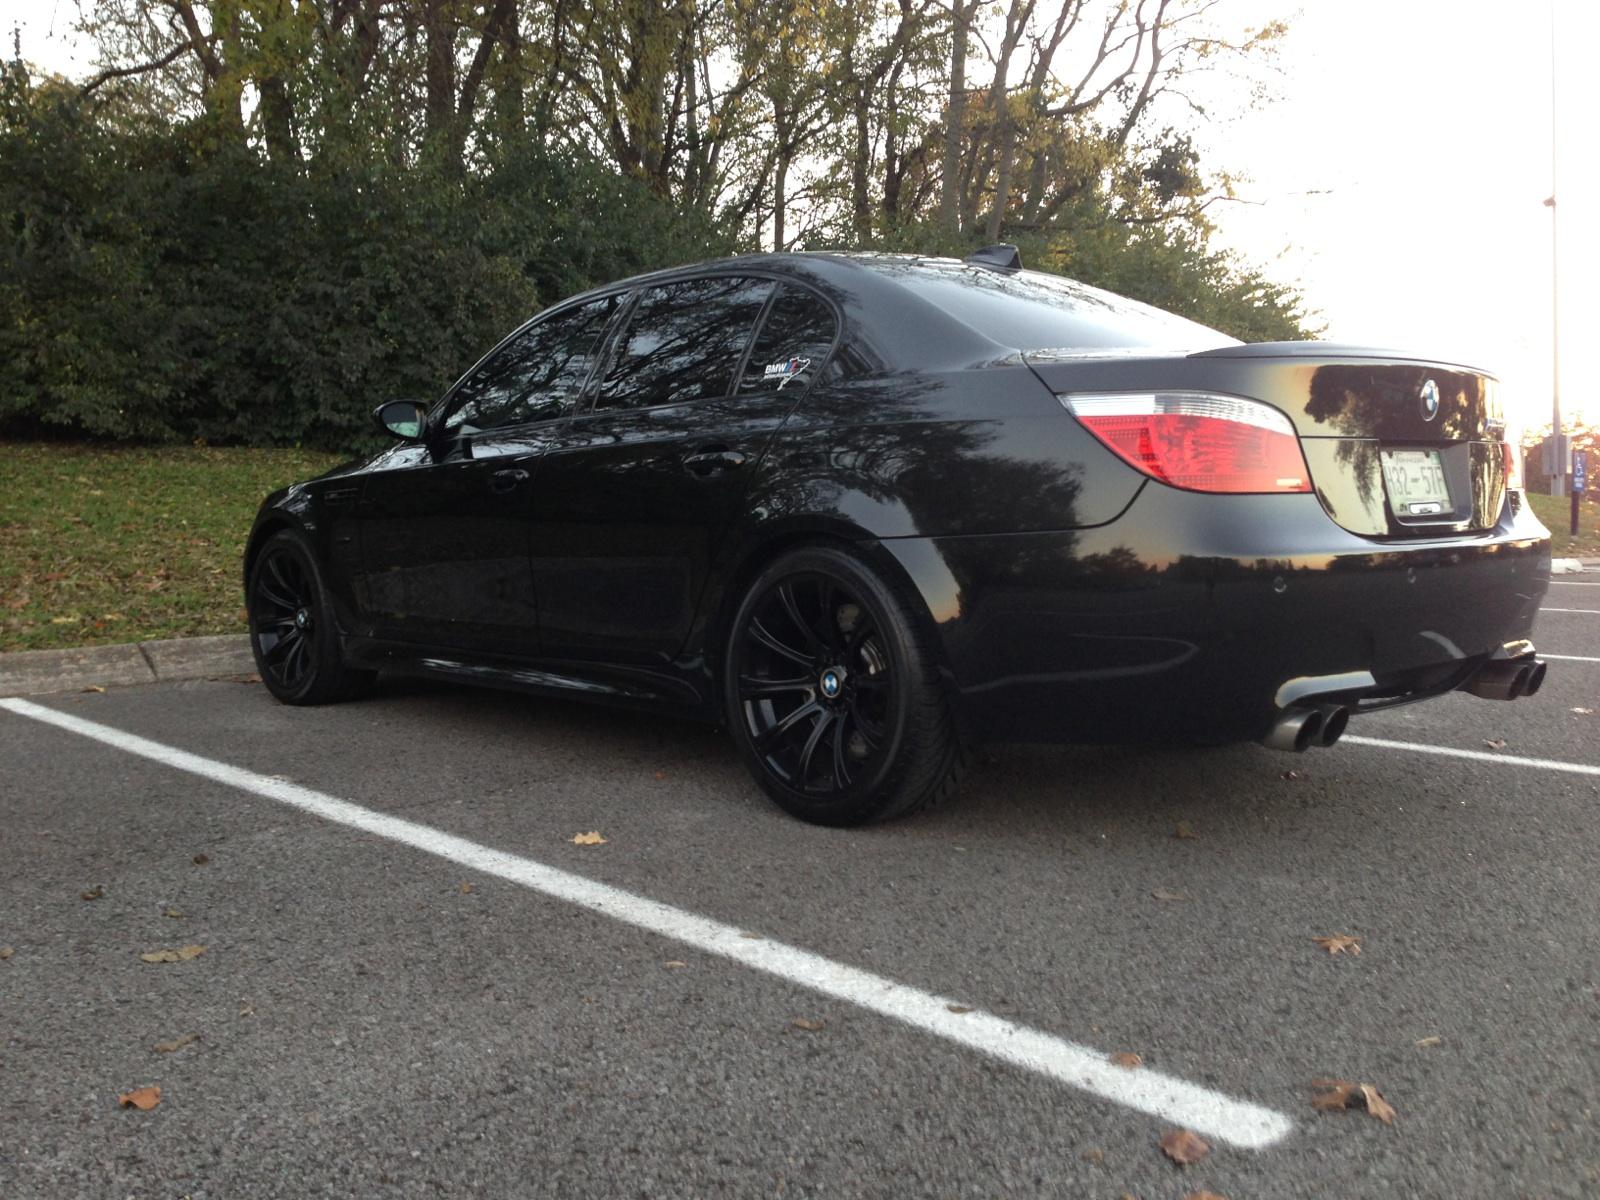 Oem Bmw Wheels >> My OEM Wheels Get Painted Gloss Black! - BMW M5 Forum and M6 Forums